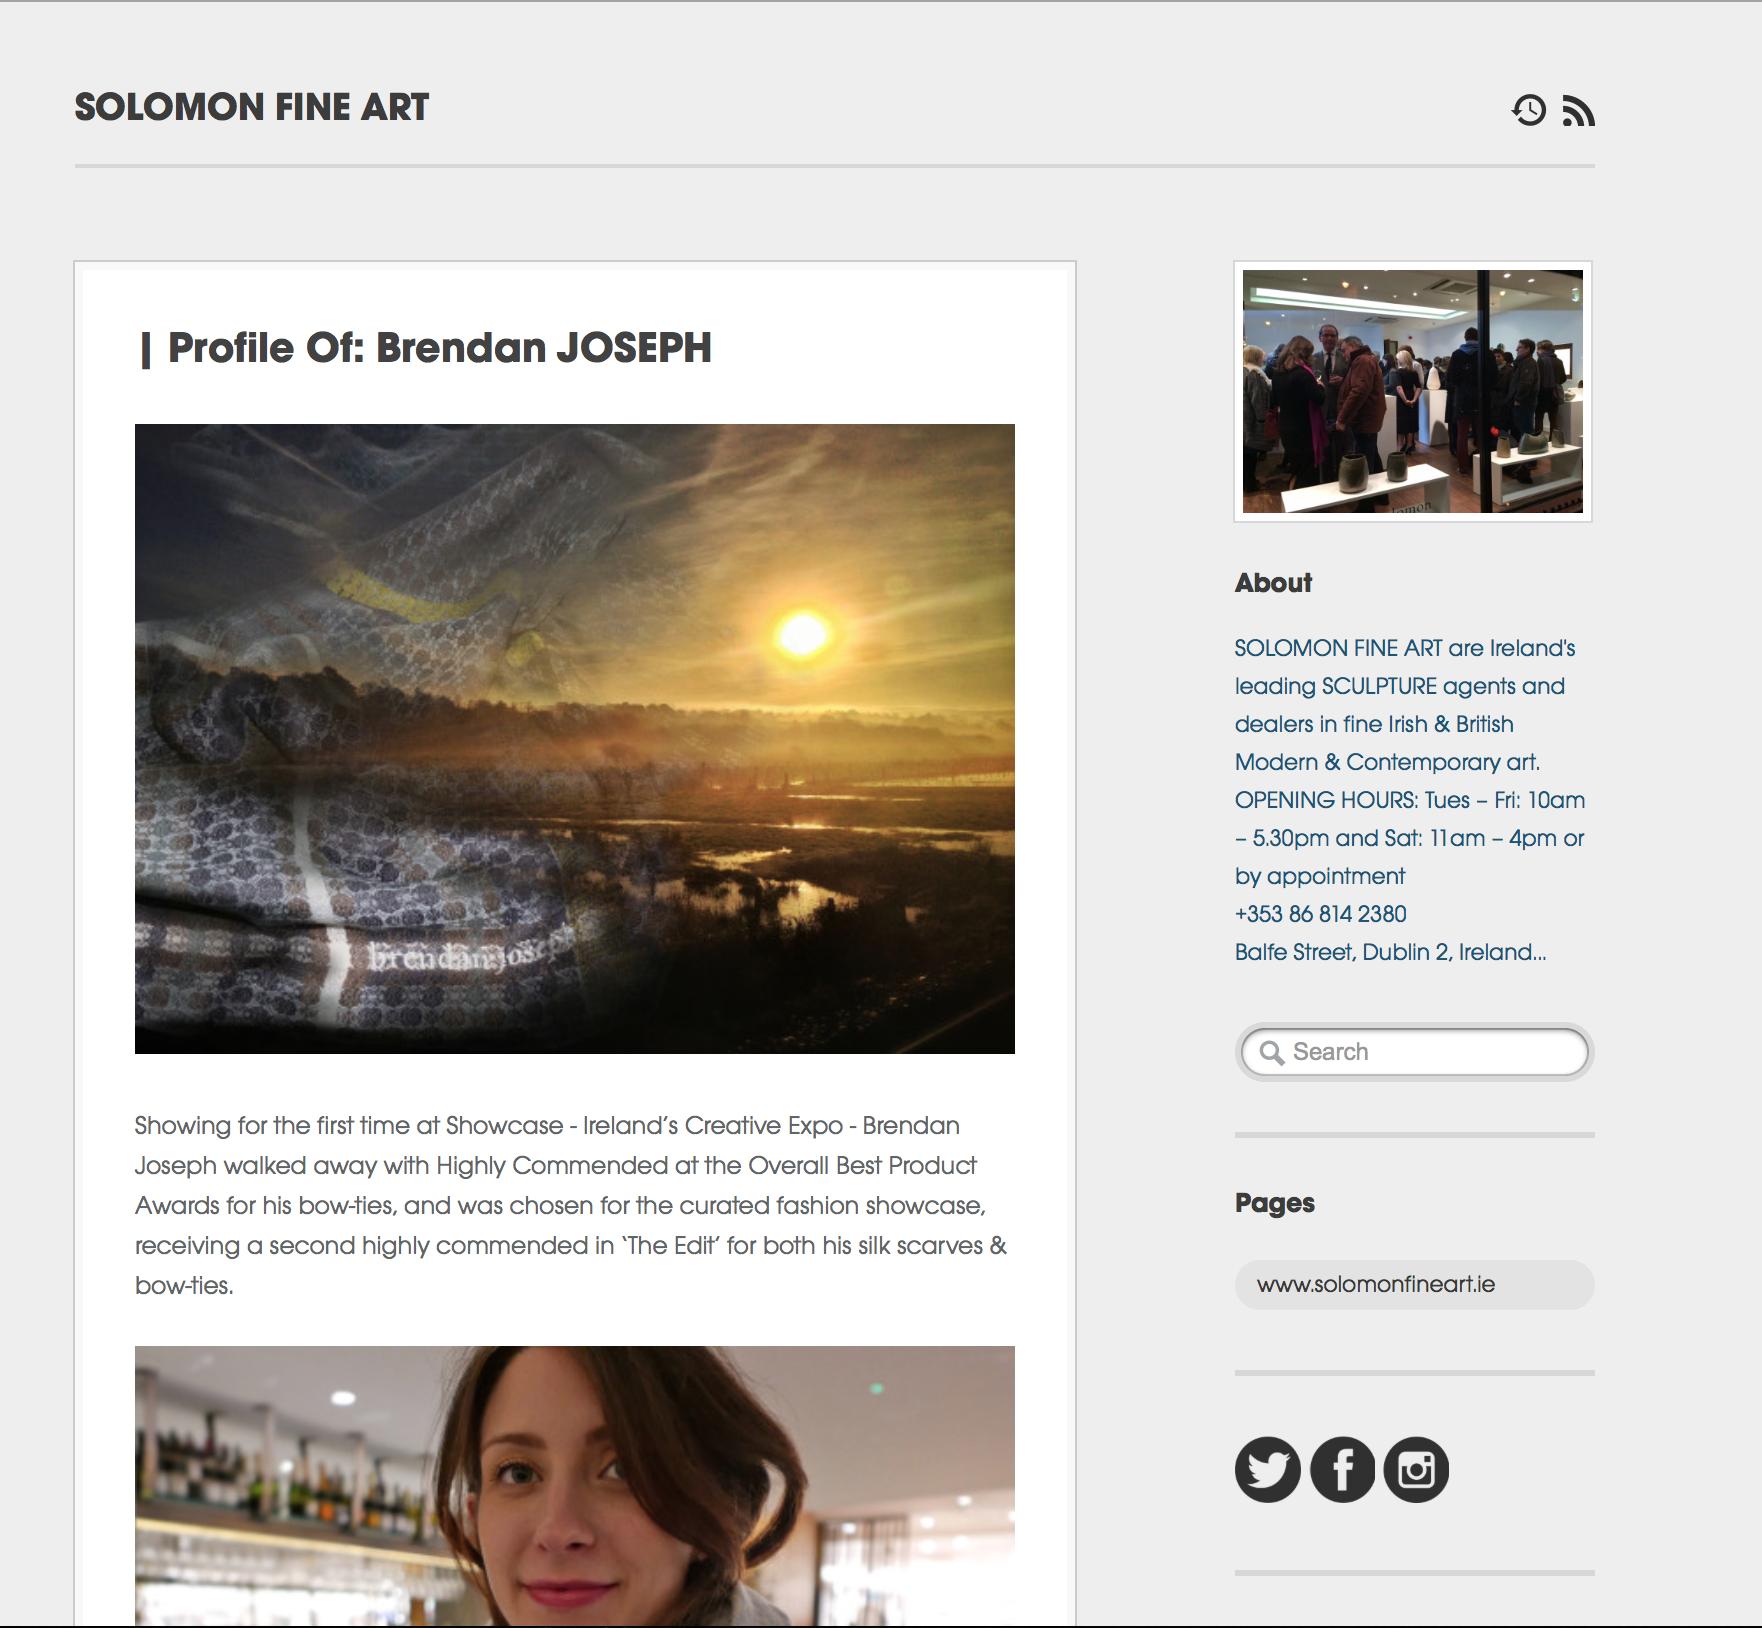 solomon-fine-art-portfolio-profile-brendan-joseph-madden-weaver